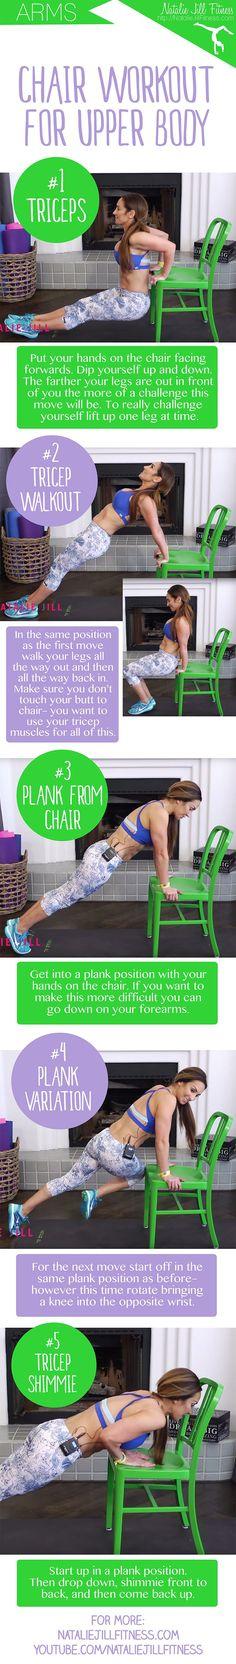 Short Gym Couleur Chair Bath Lift 29 Best Natalie Jill Fitness Programs Images 5 Minute Beginner Workout For Upper Body Video